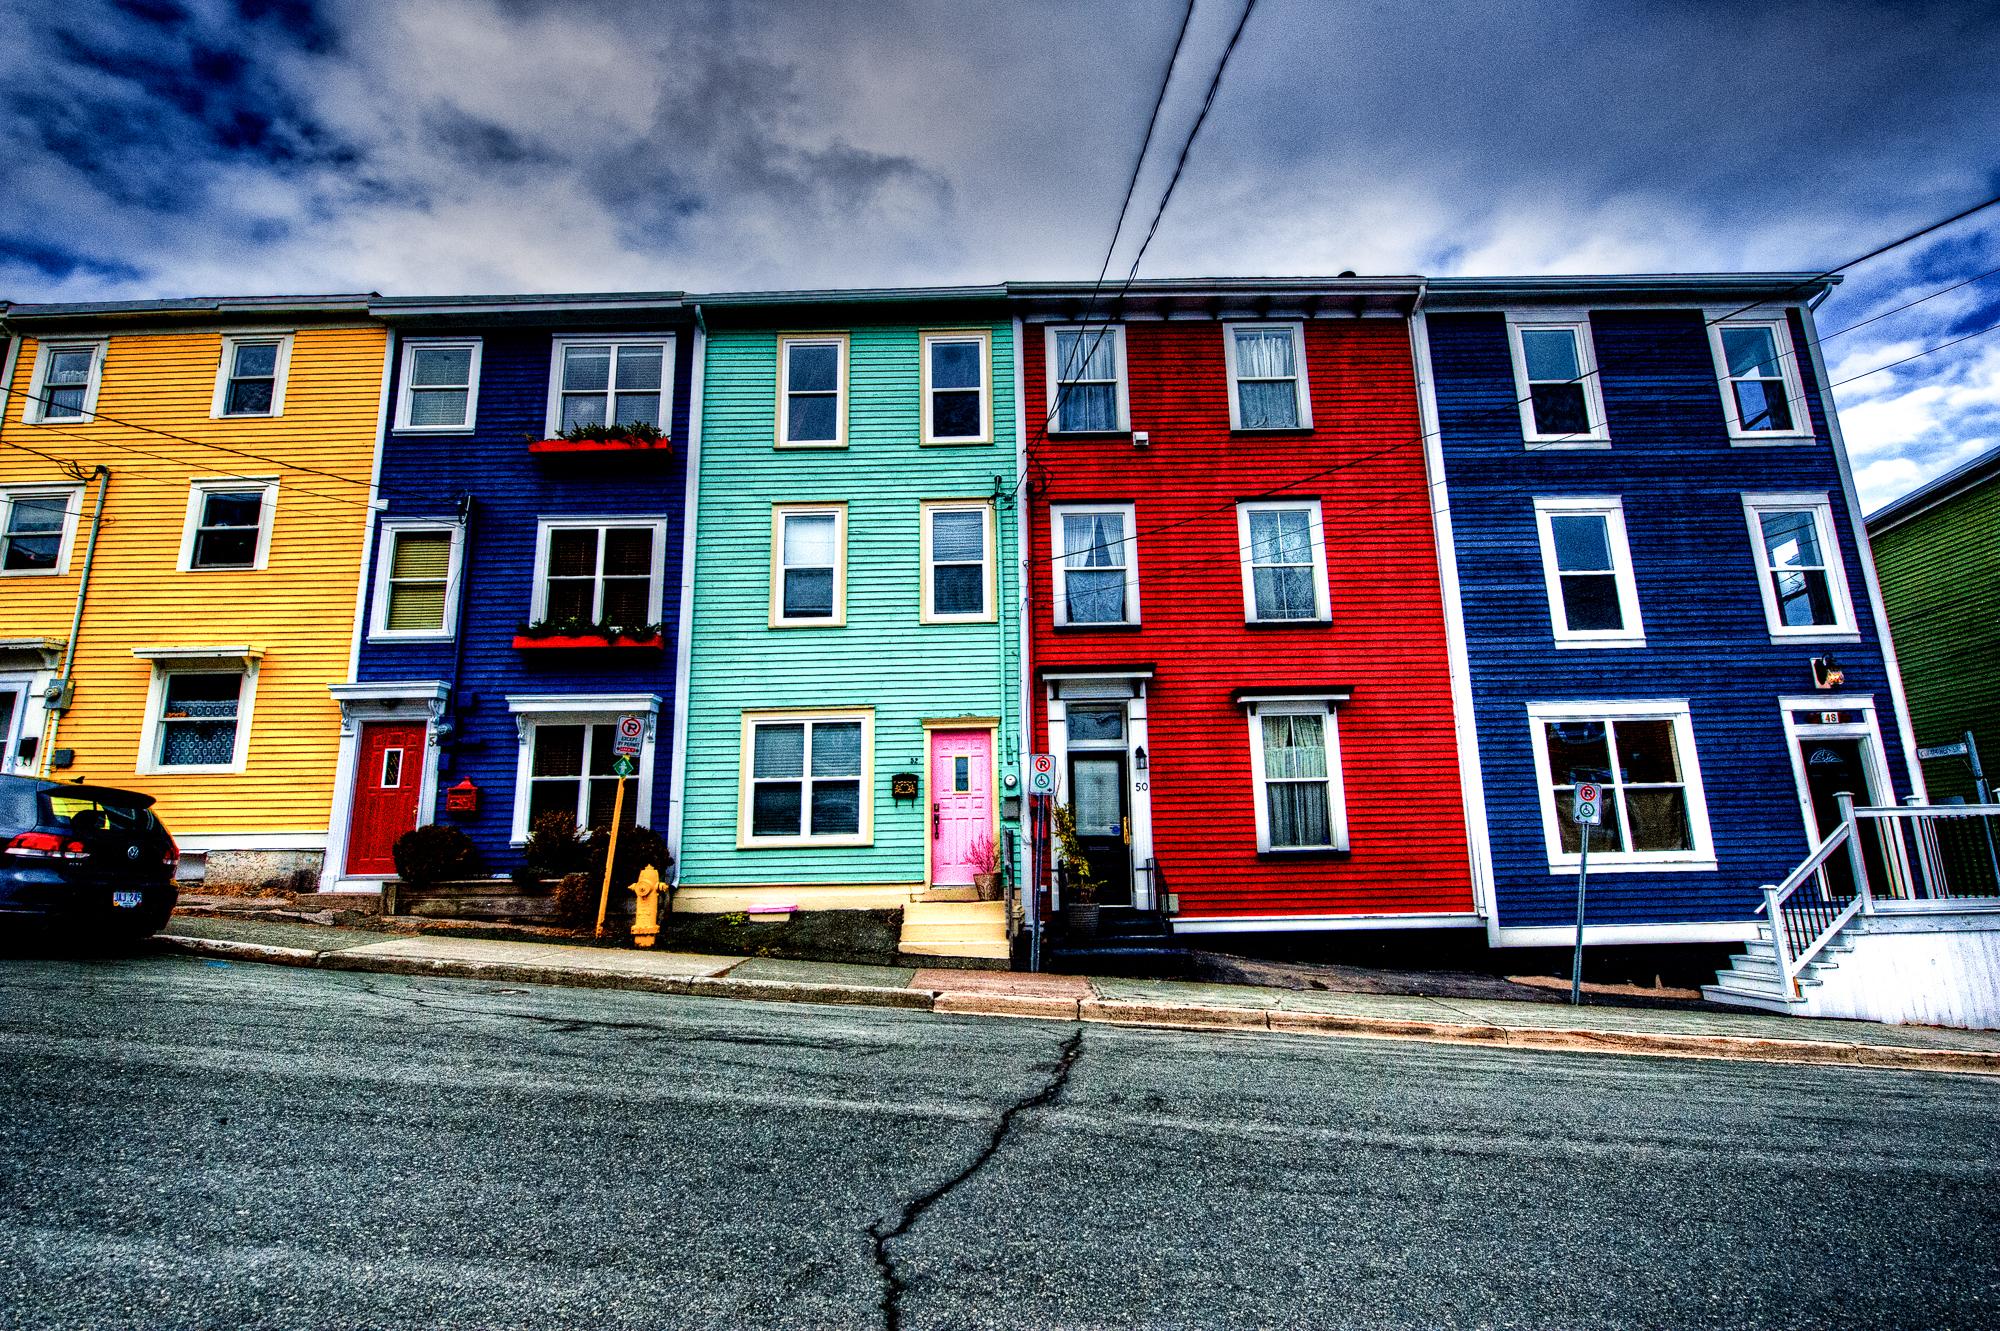 Saturday    August 3, 2019   George Street Festival Sevens  St. John's, Newfoundland and Labrador